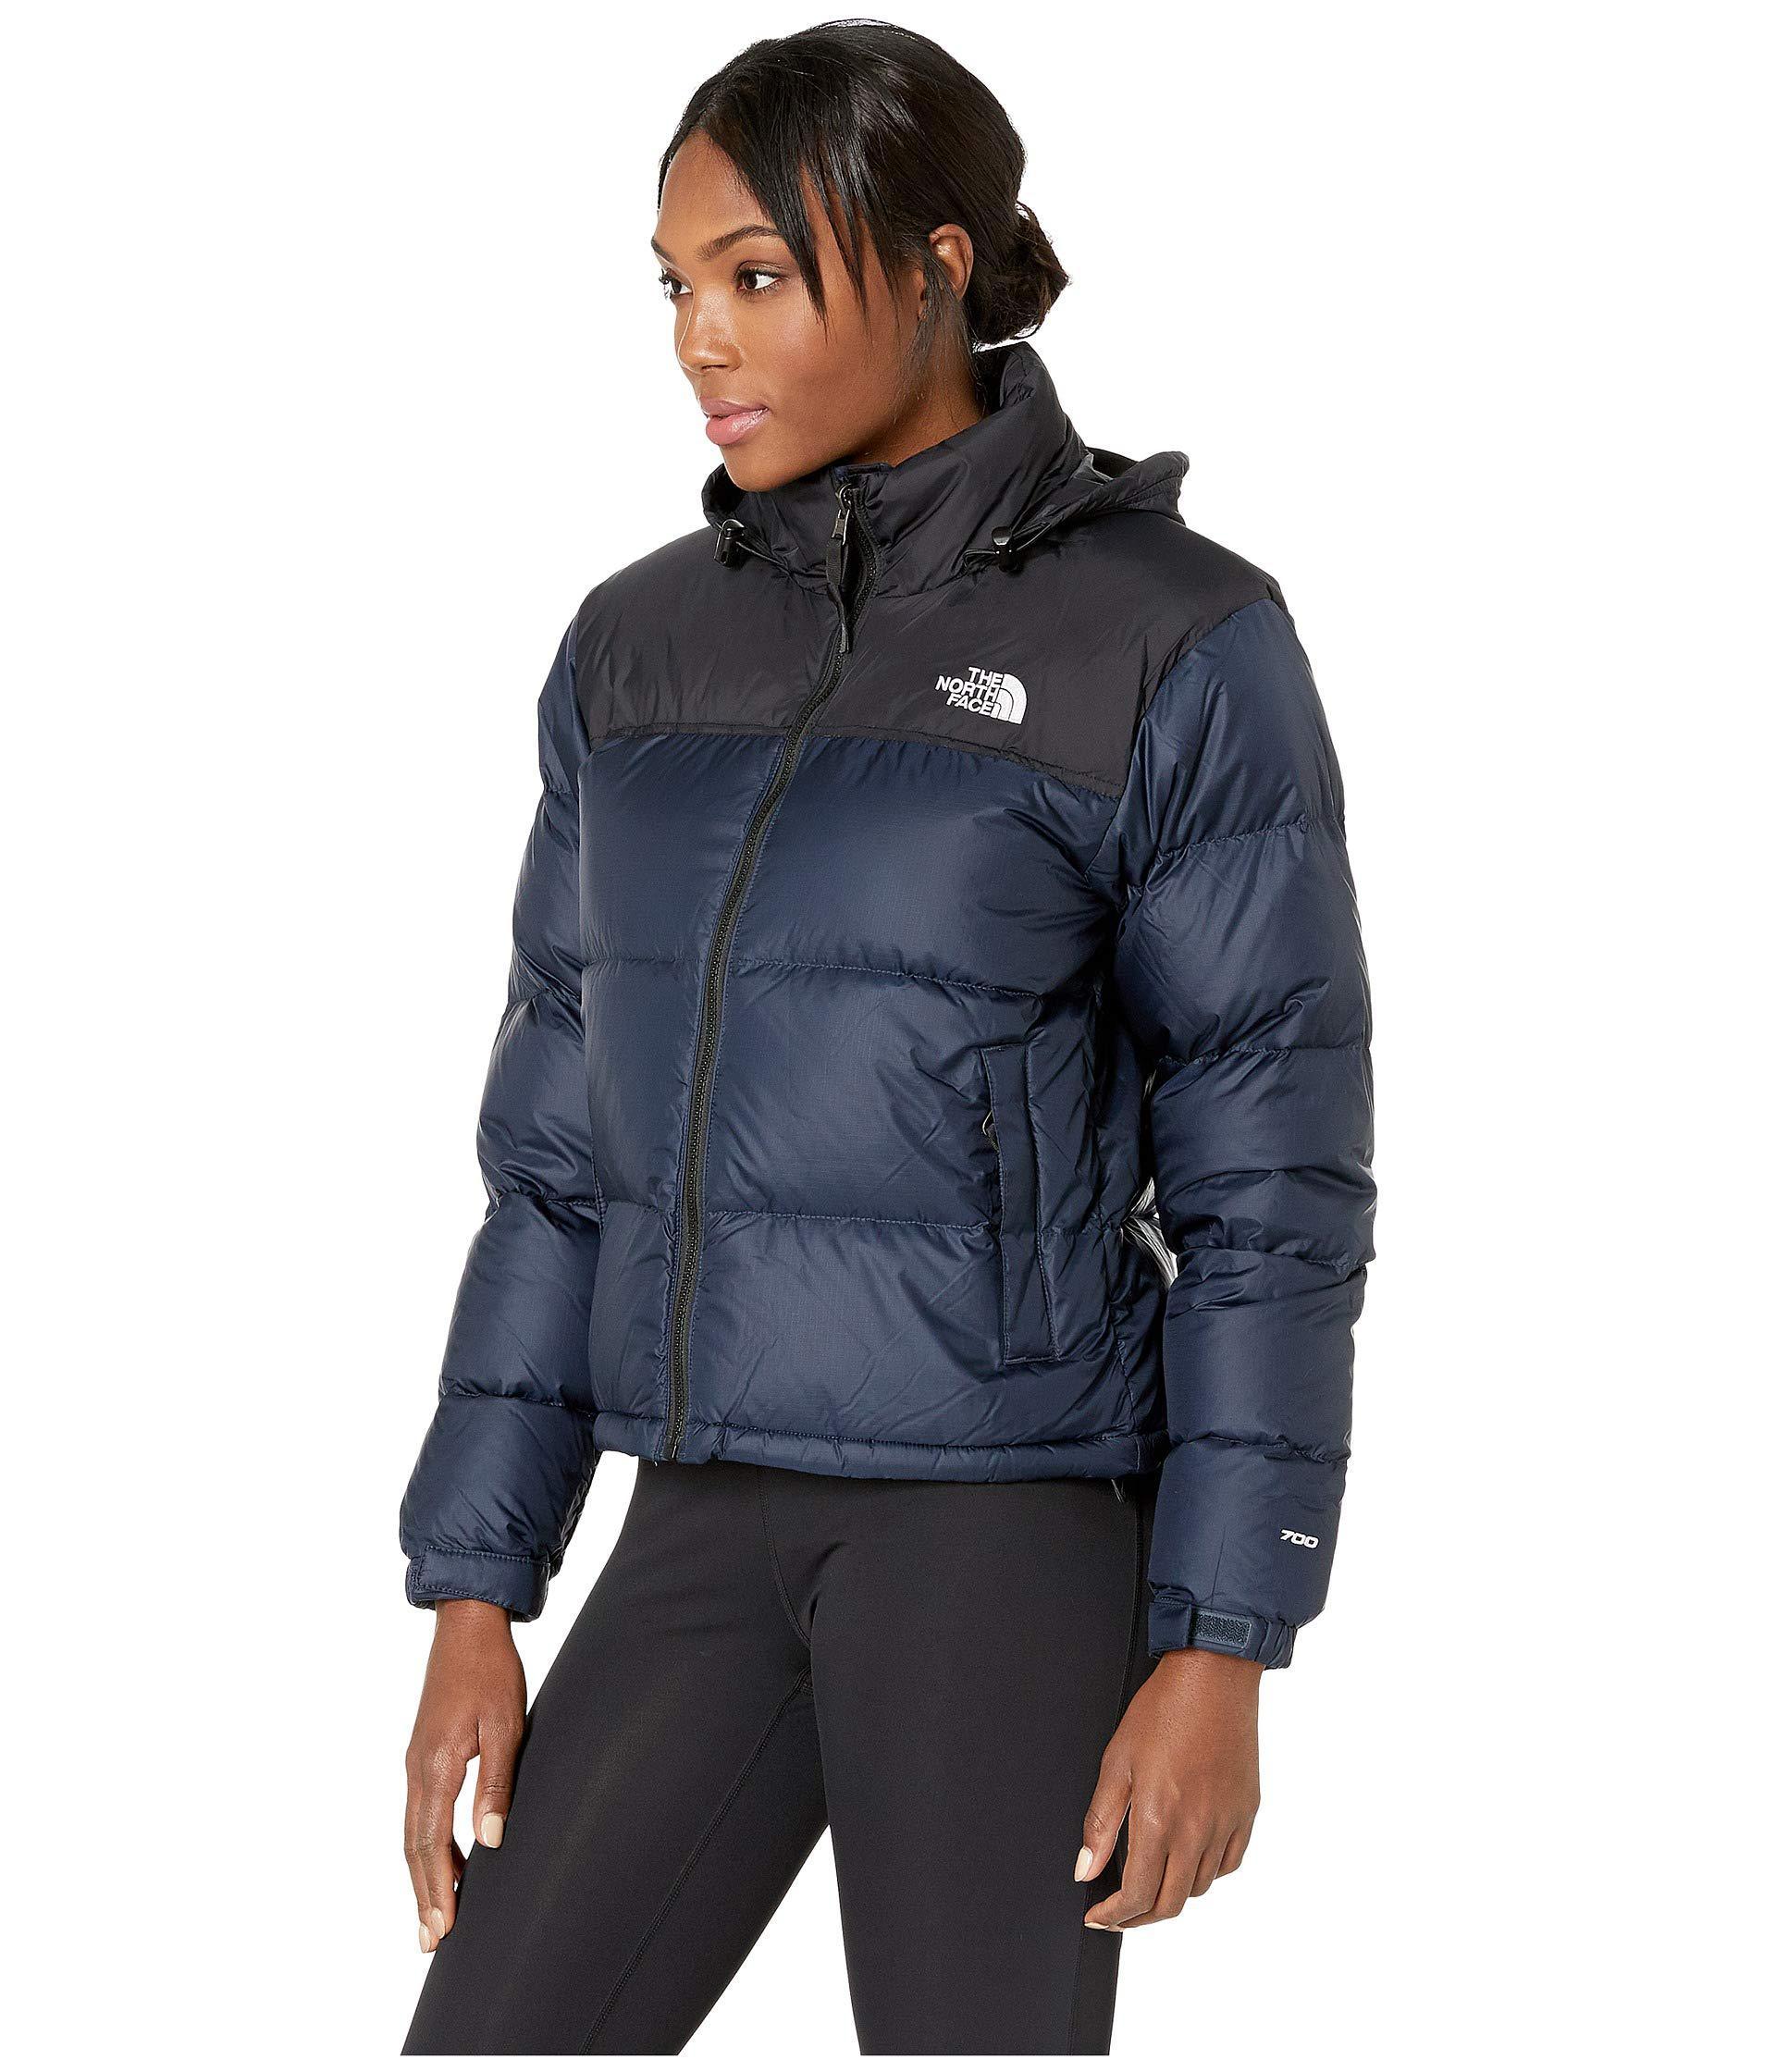 Lyst The North Face 1996 Retro Nuptse Jacket Tnf Medium Grey